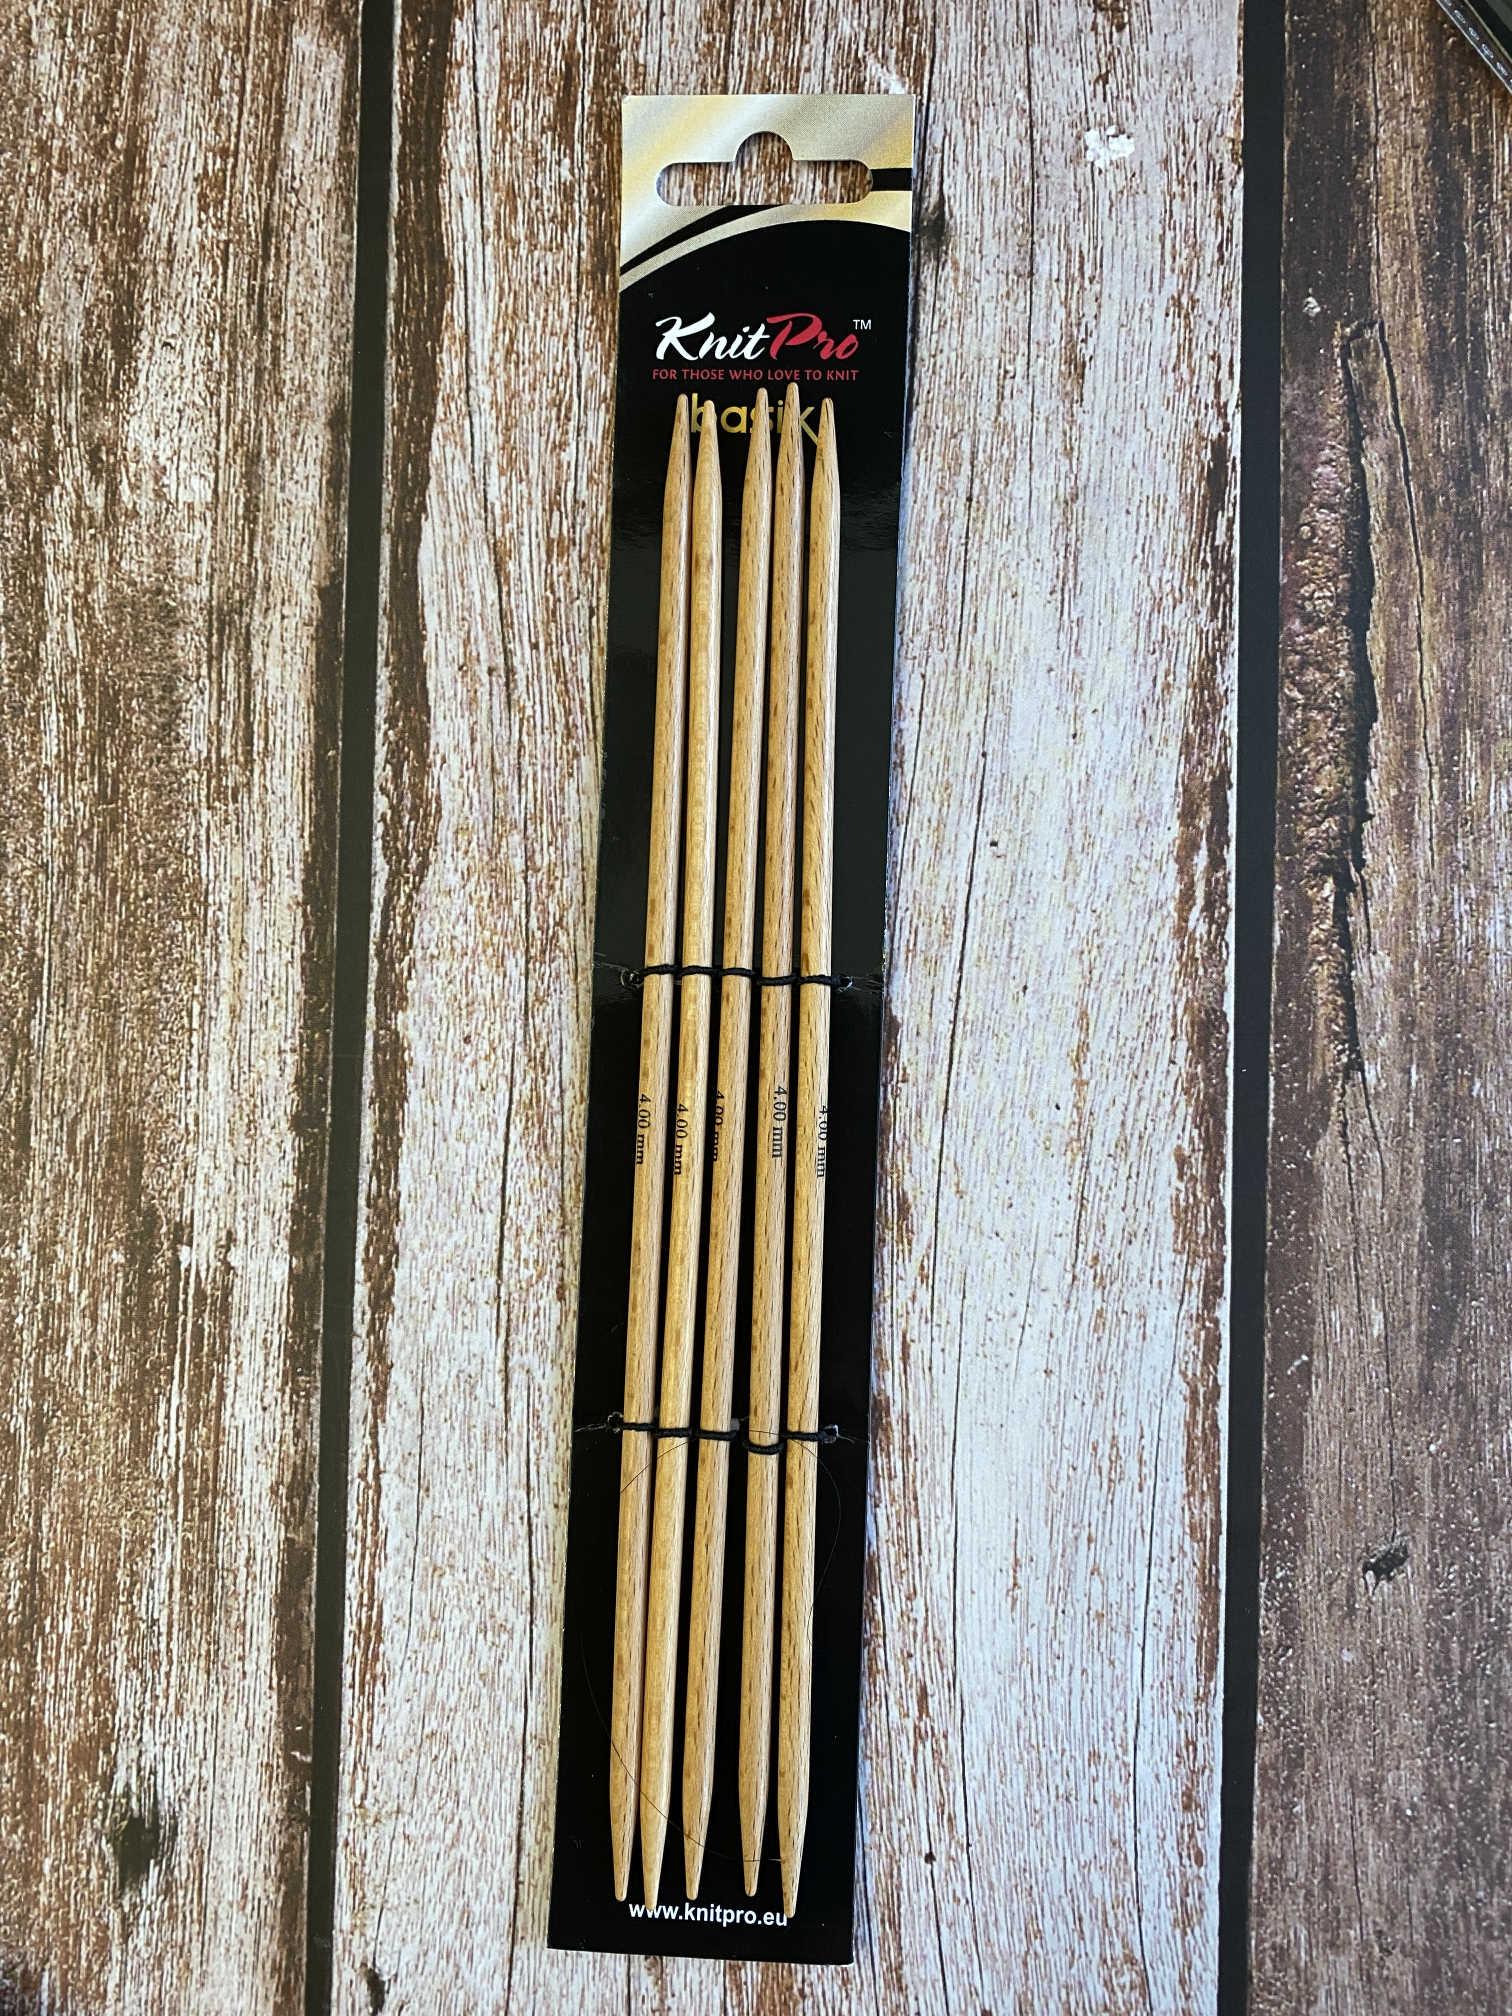 Basix Birch DPNs - 20cm / 8in